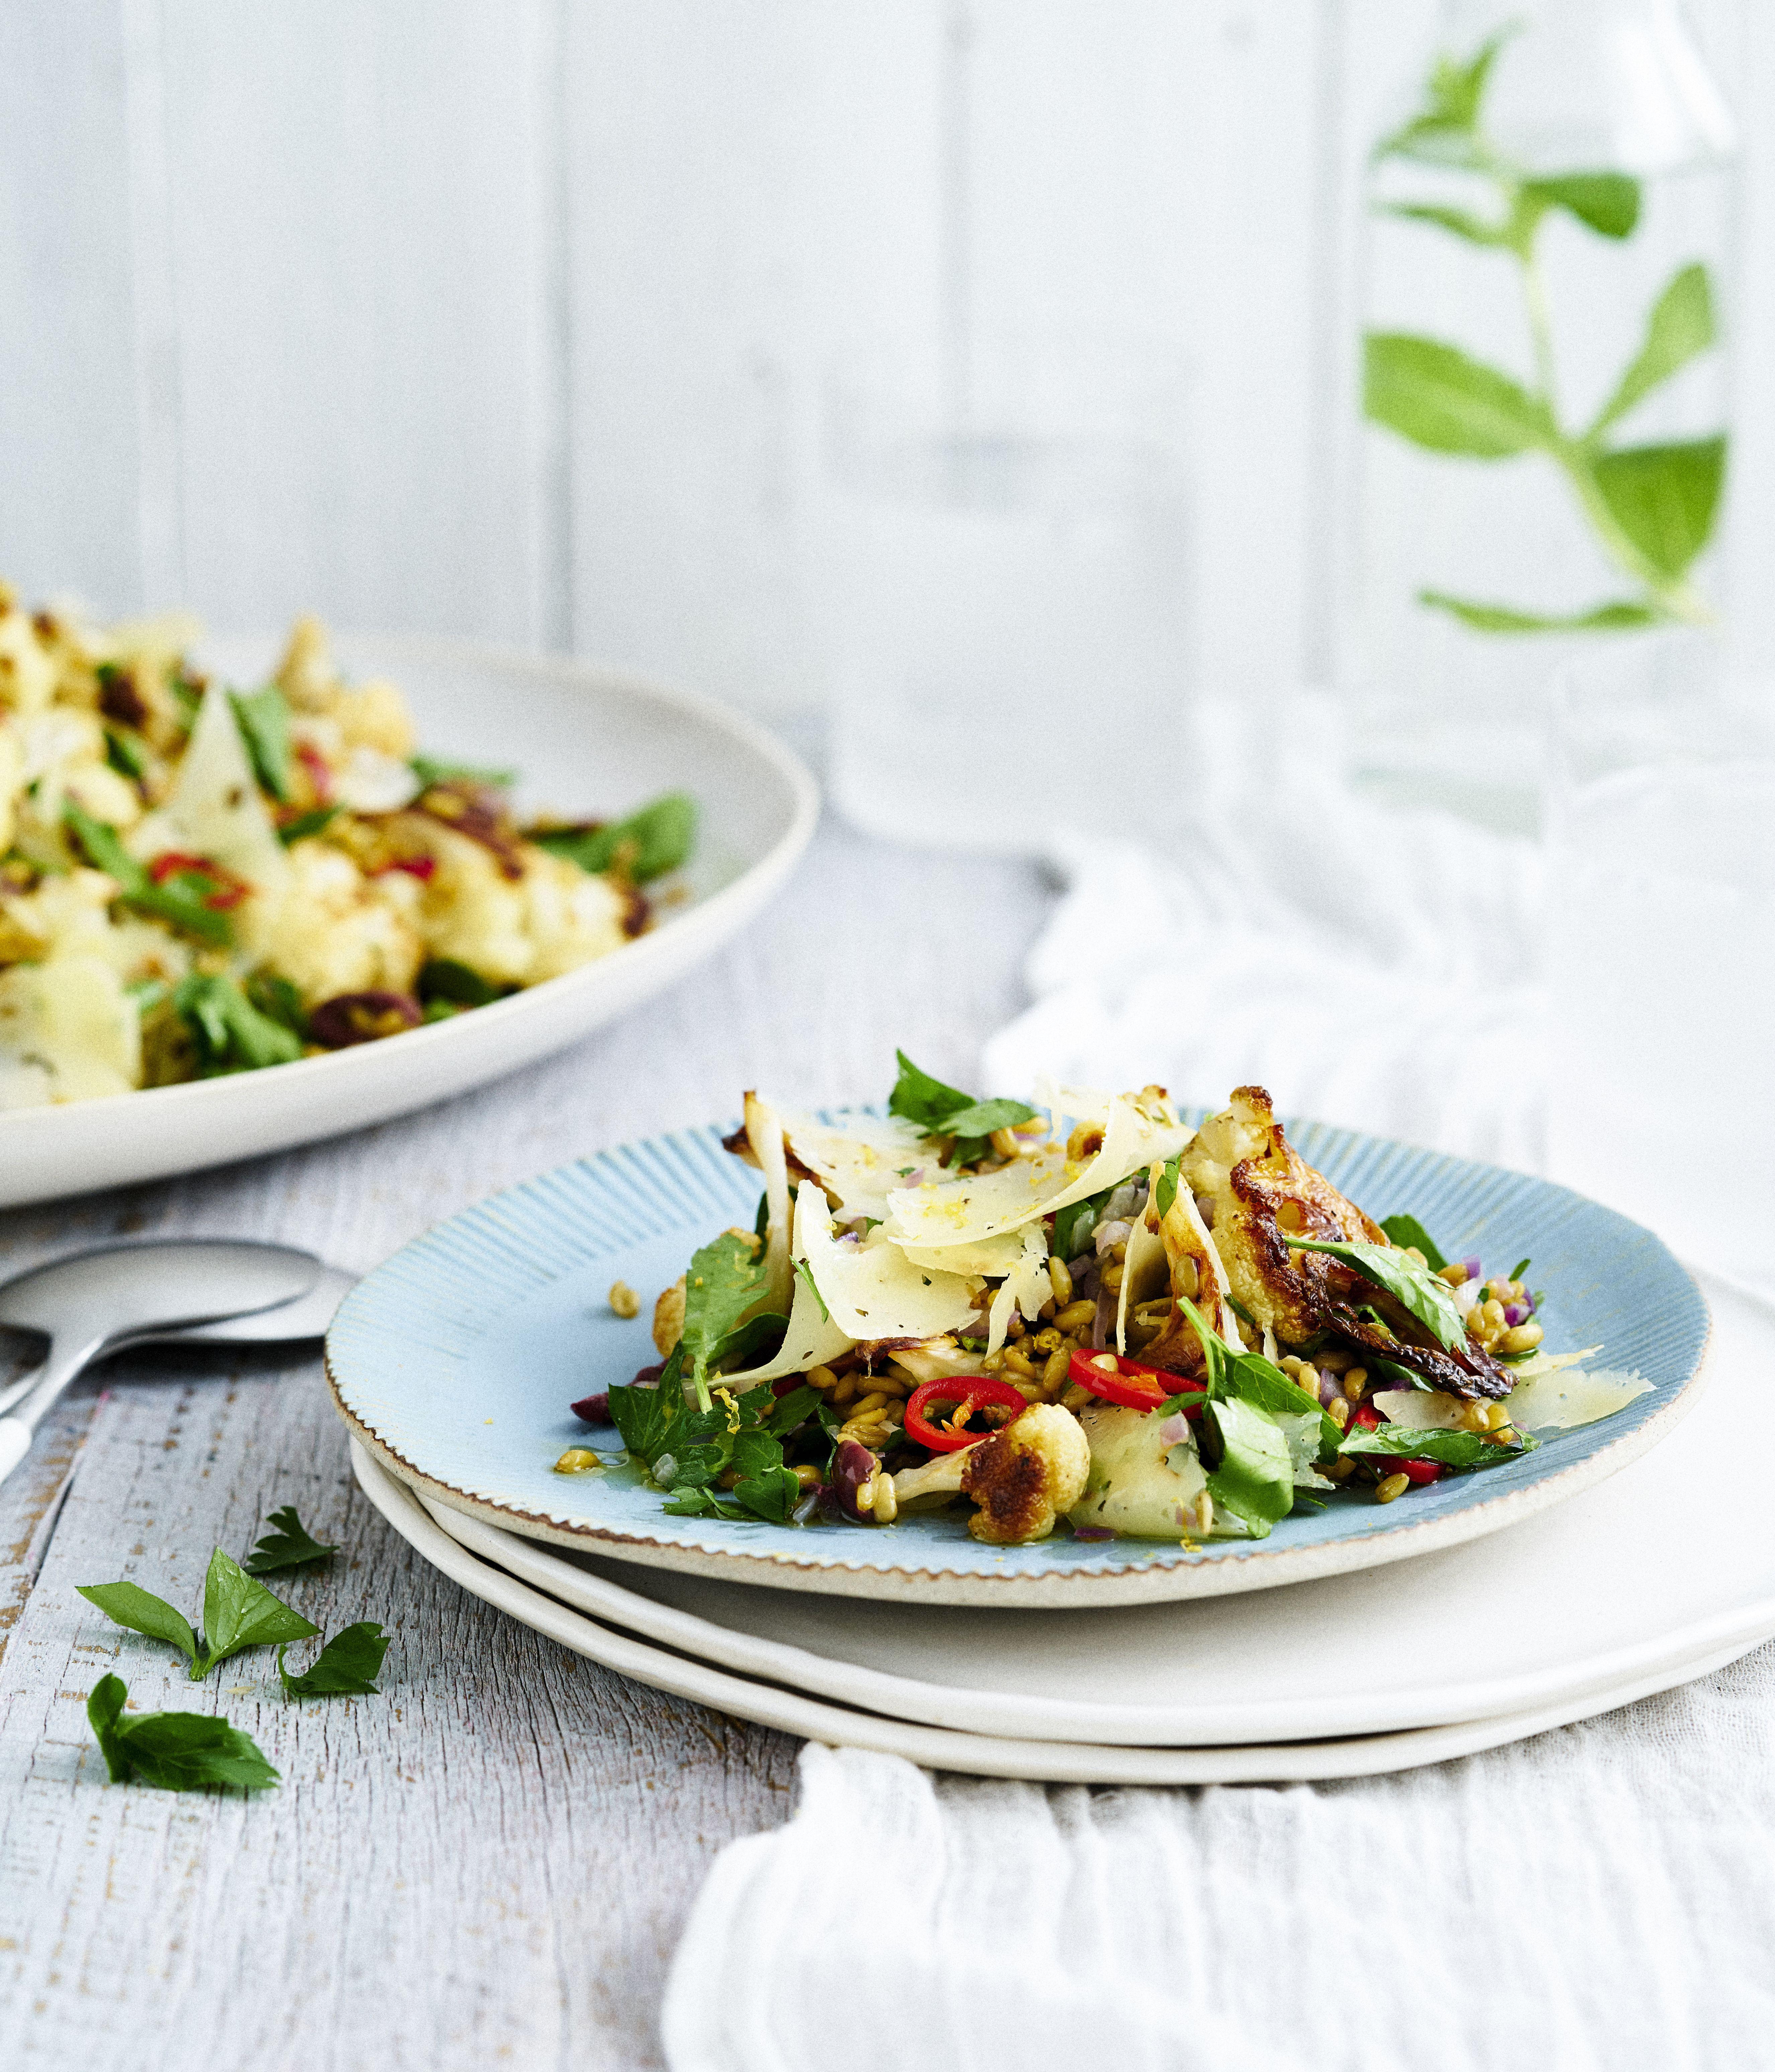 Yields farro and cauliflower salad recipe sydney salad and yields farro and cauliflower salad recipe sydney salad and salad dressings forumfinder Images